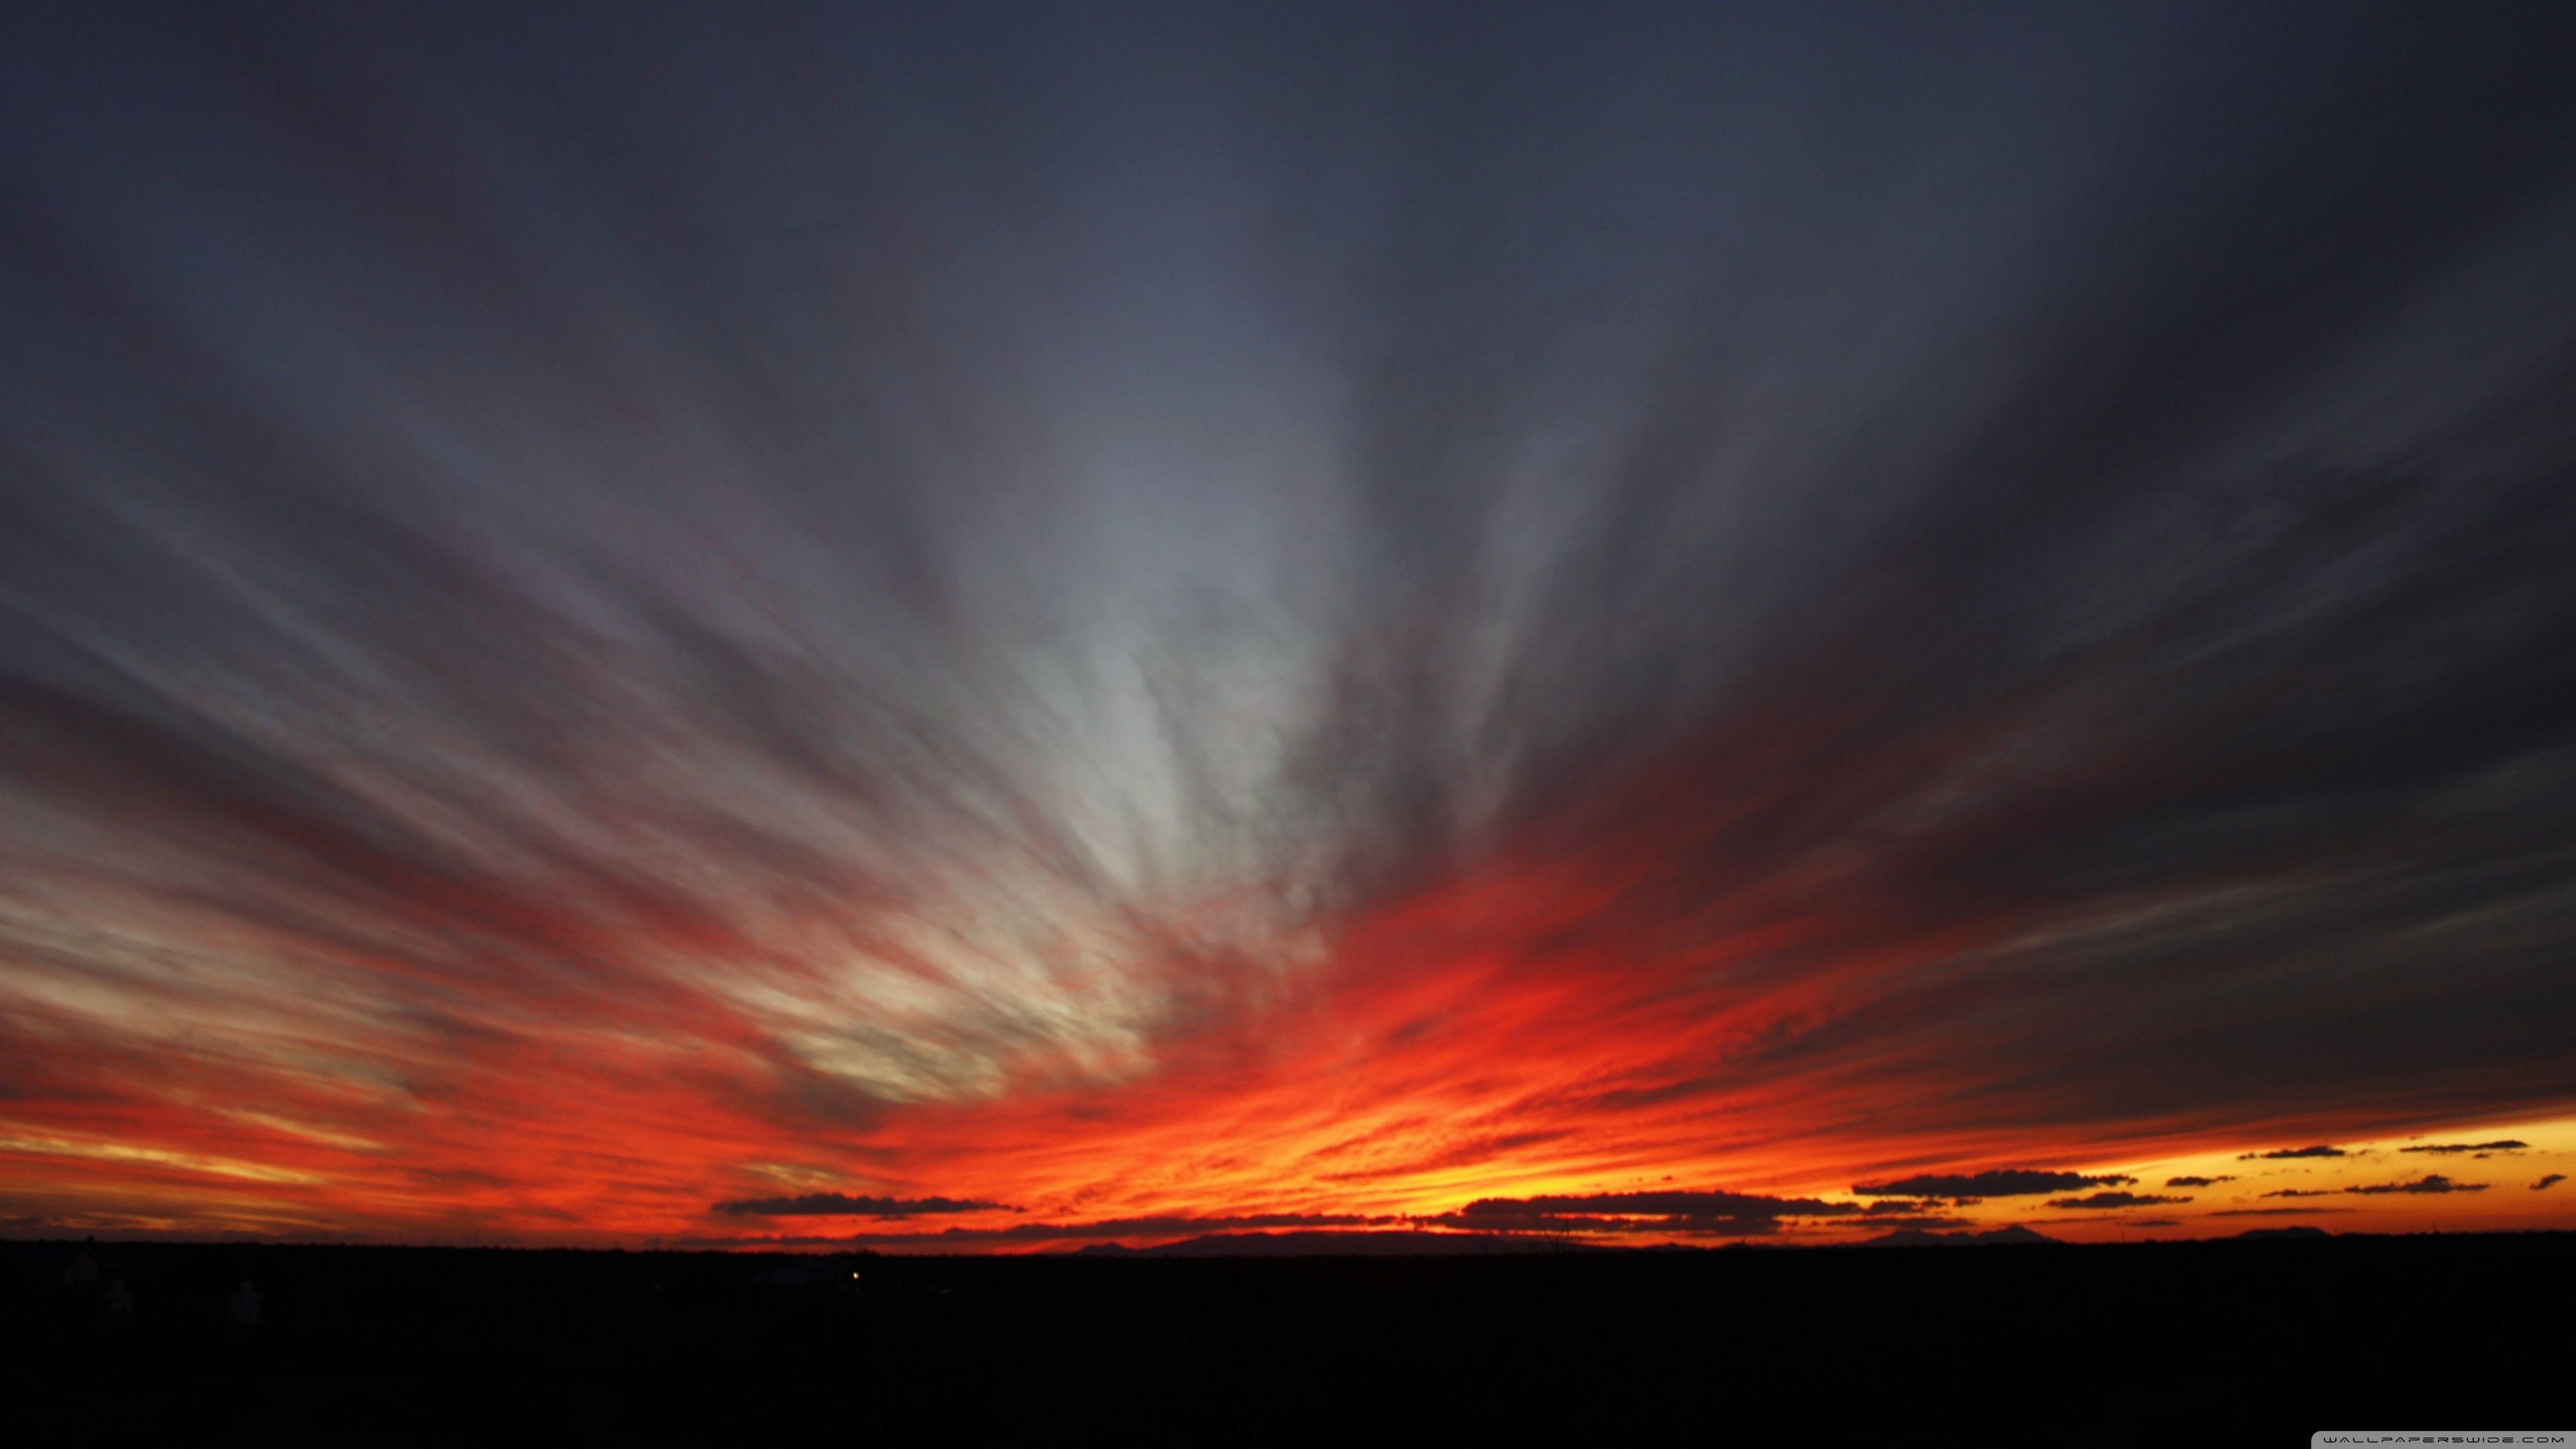 55 AZ Sunset Wallpapers   Download at WallpaperBro 3840x2160